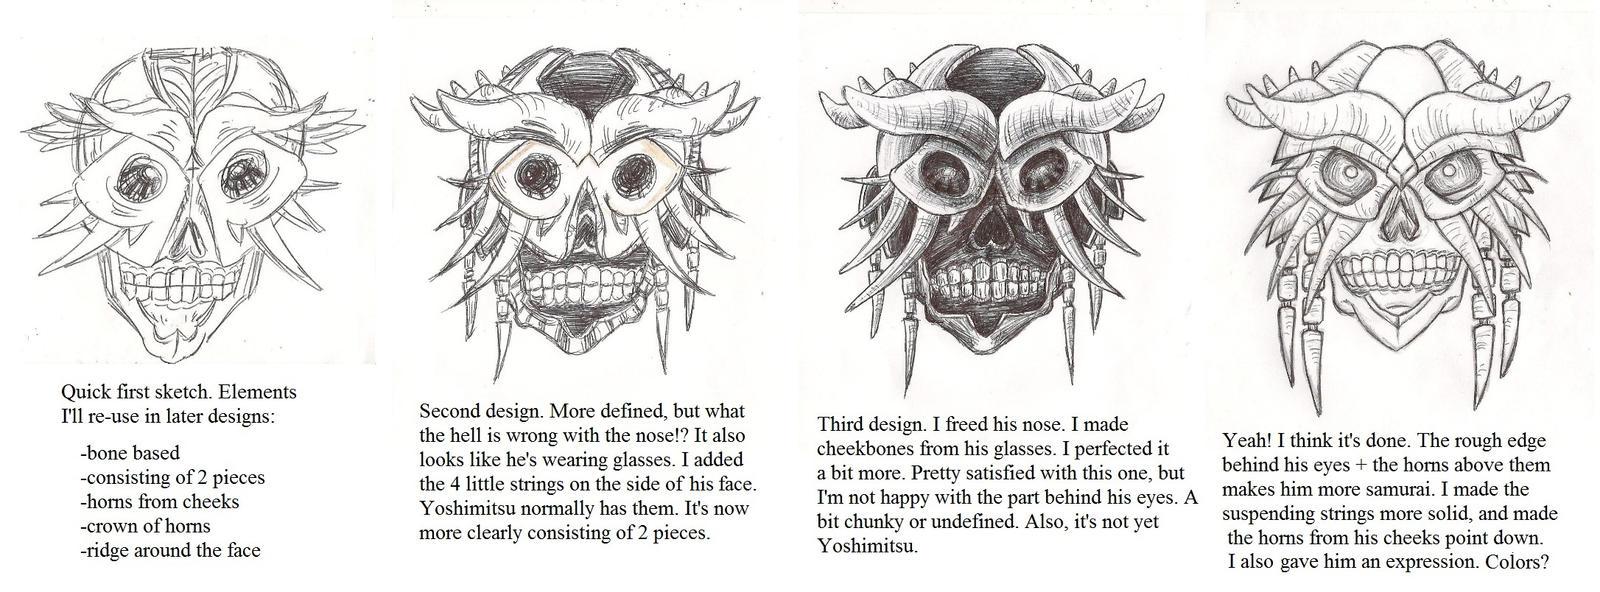 Yoshimitsu Character Design : New yoshimitsu mask designs by kihunter on deviantart